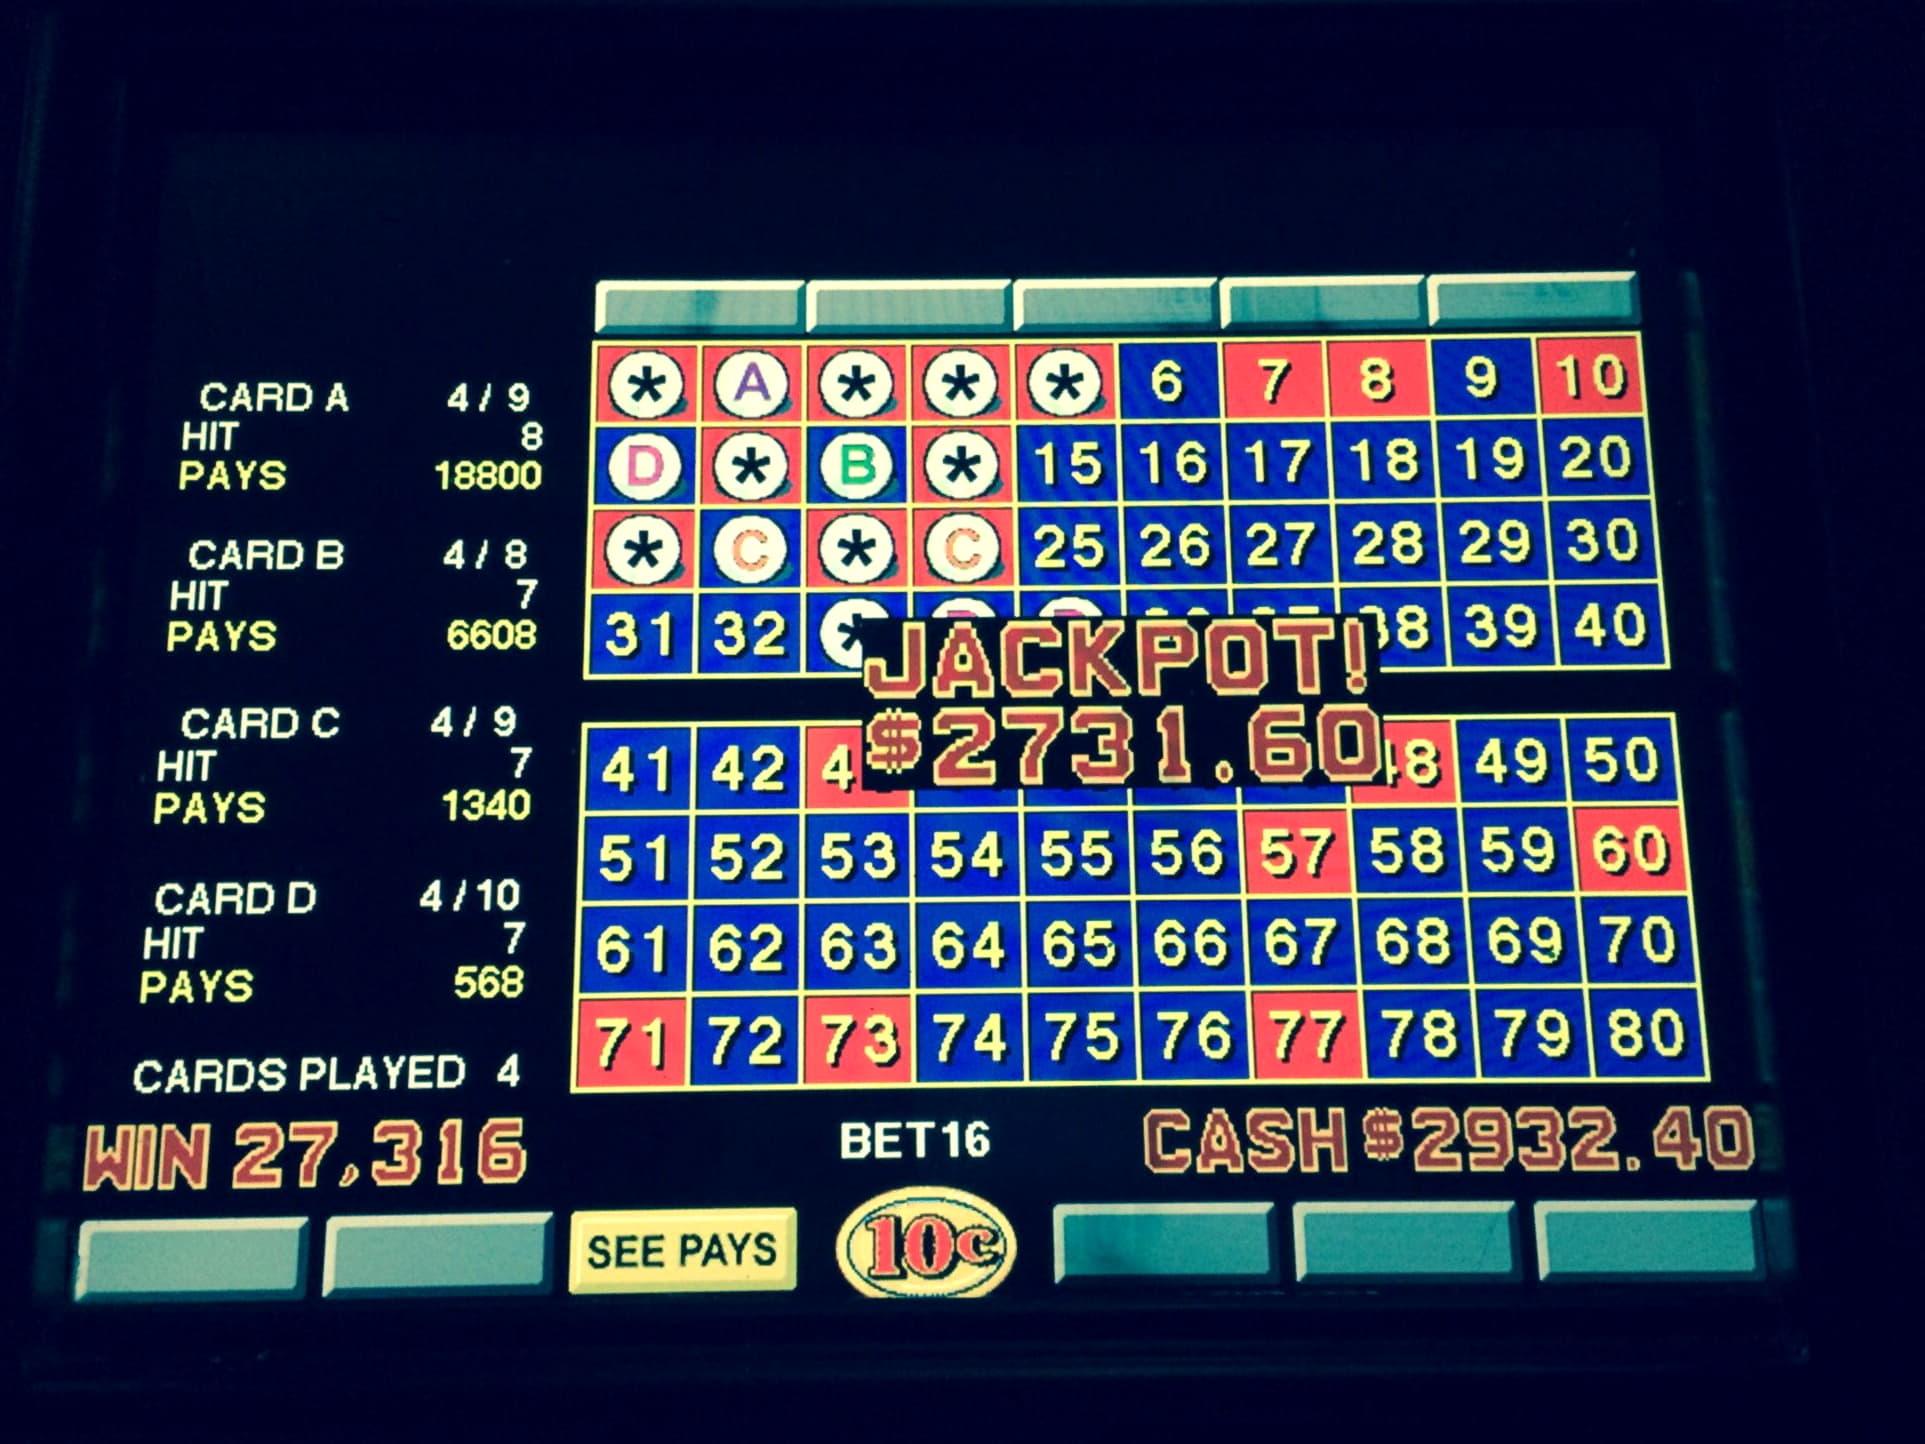 190 Free Spins no deposit casino at 888 Casino